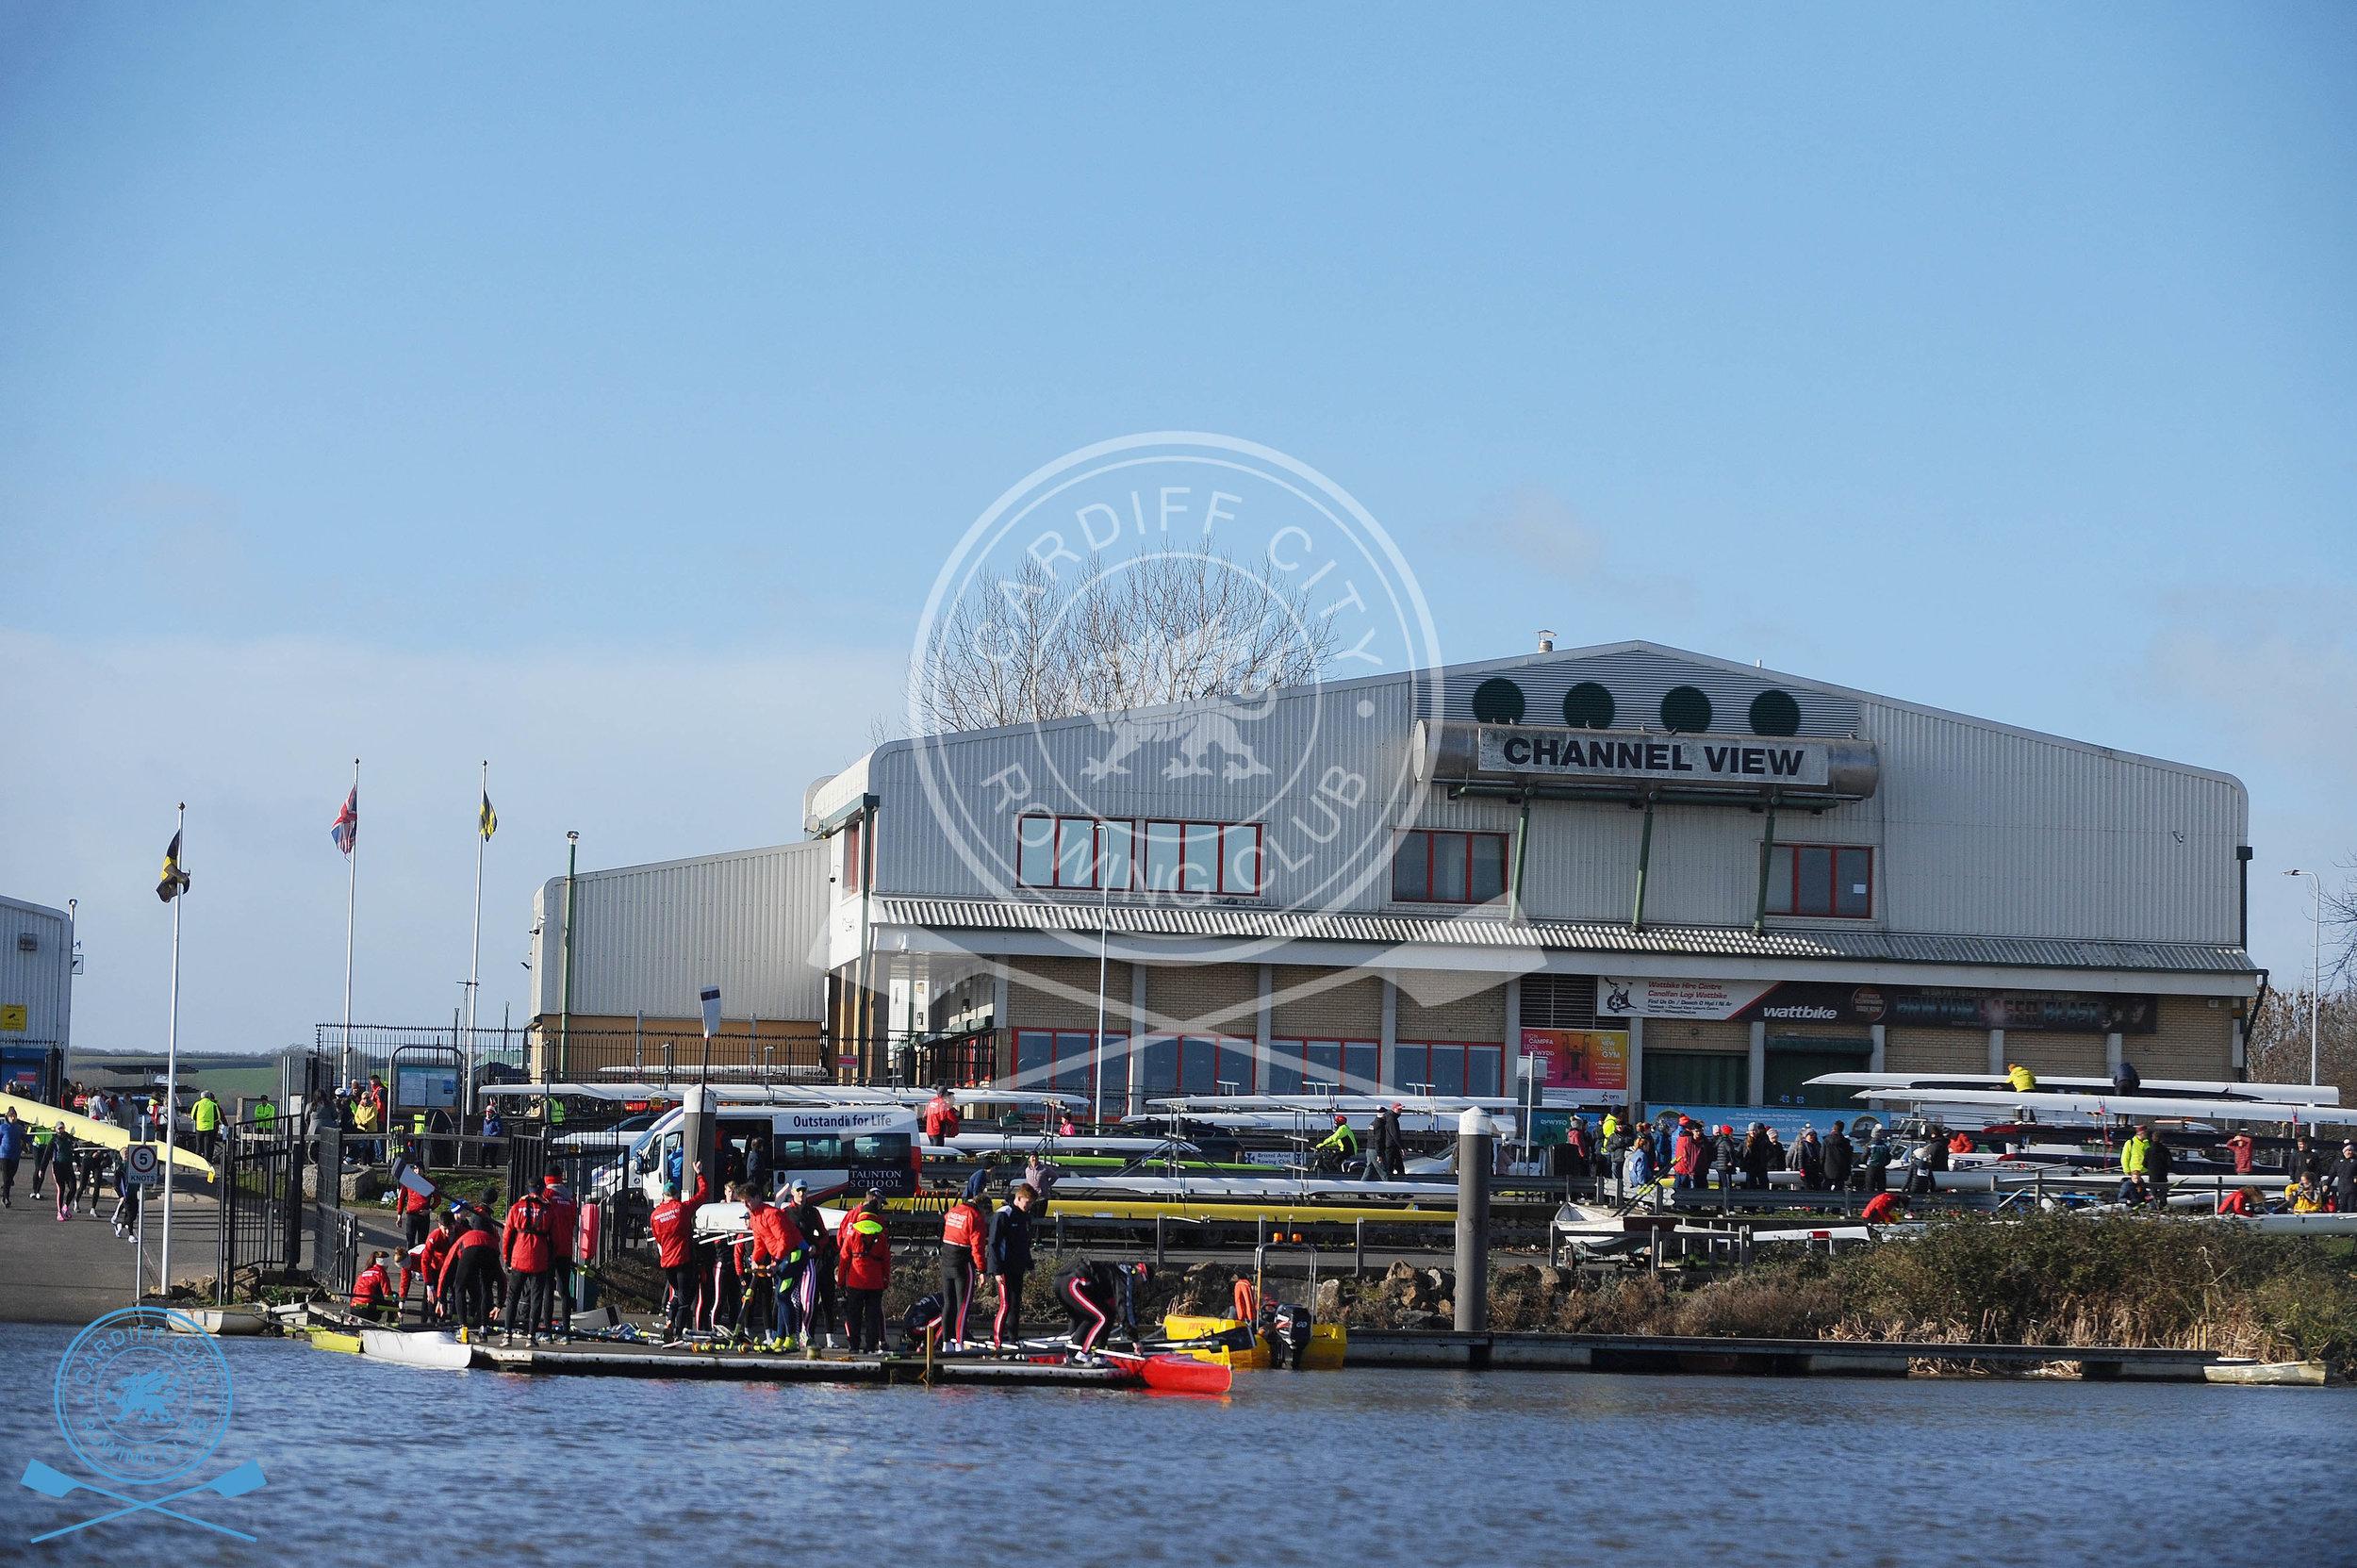 DW_280119_Cardiff_City_Rowing_245.jpg